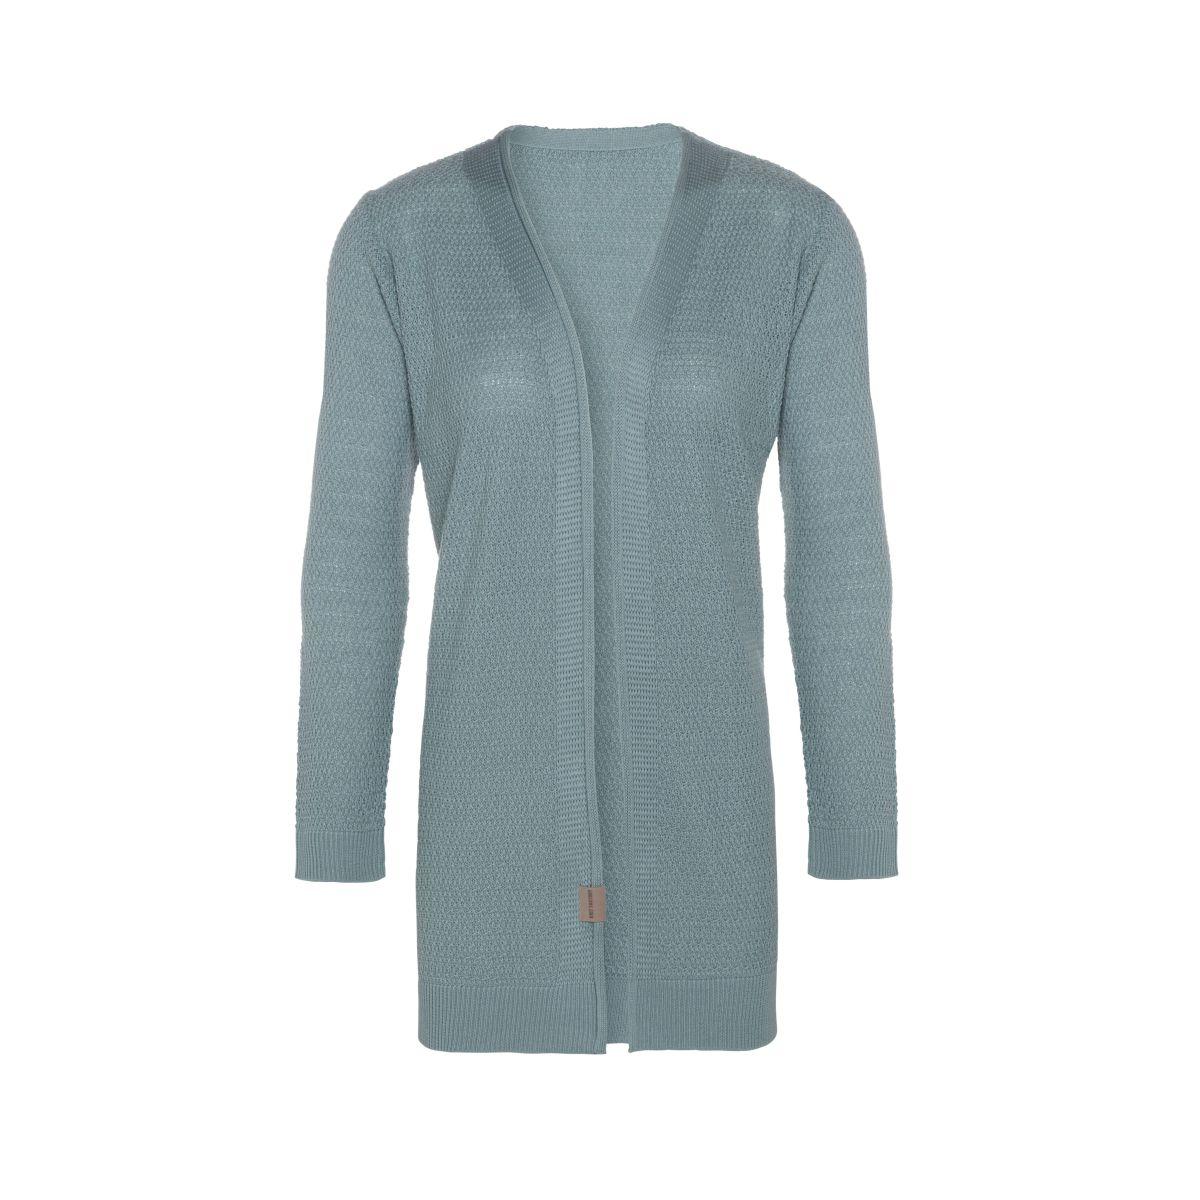 knit factory kf14108100949 june vest stone green 3648 1